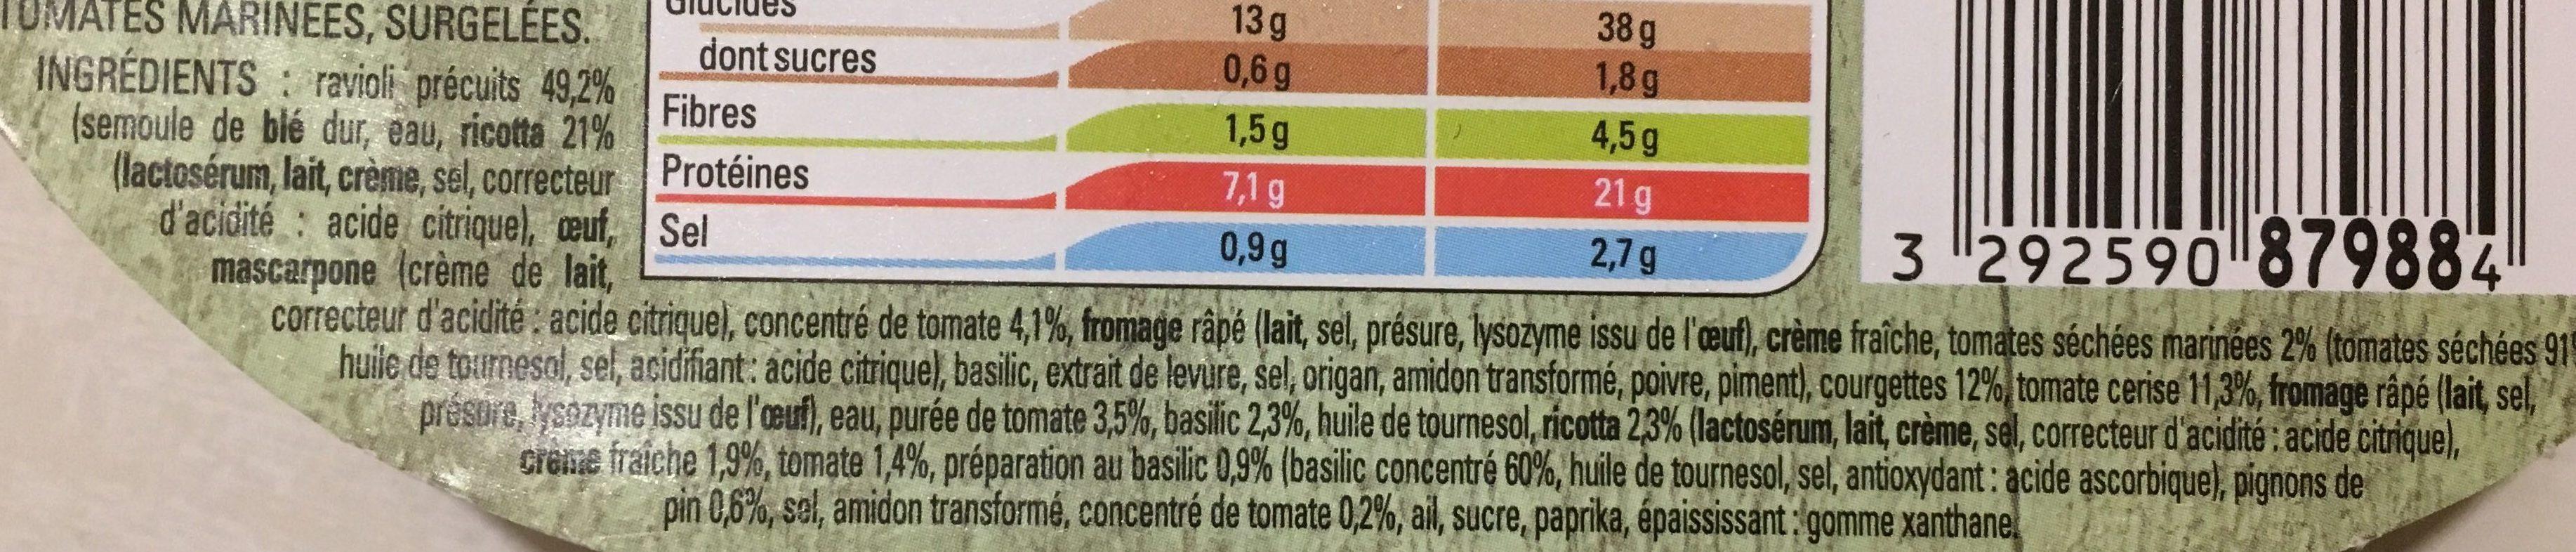 Ravioli ricotta tomates marinées sauce pesto rosso - Ingrédients